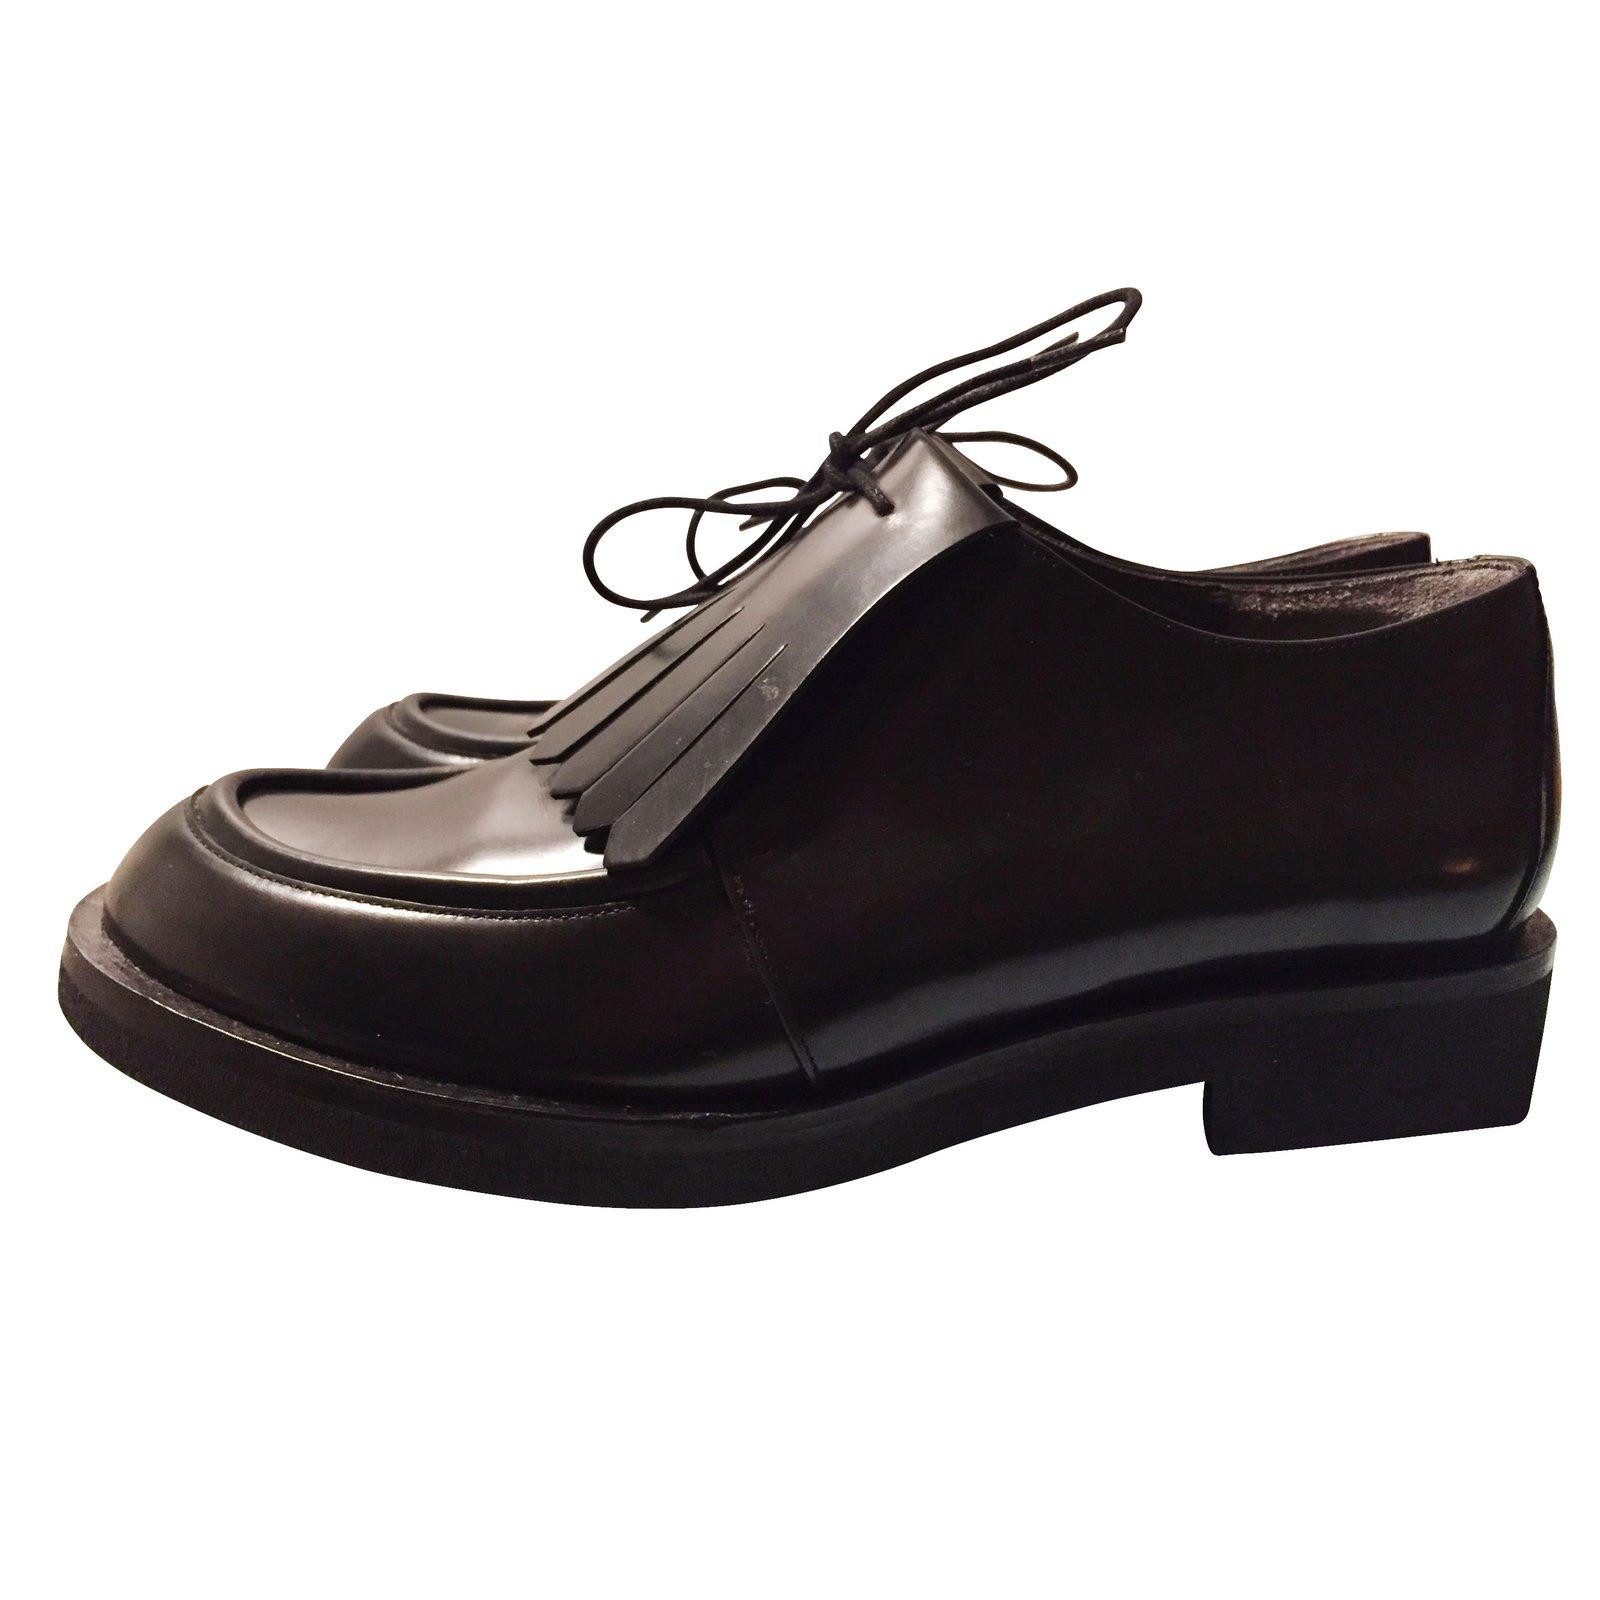 derbies robert clergerie derbies en cuir vernis noir cuir vernis noir joli closet. Black Bedroom Furniture Sets. Home Design Ideas